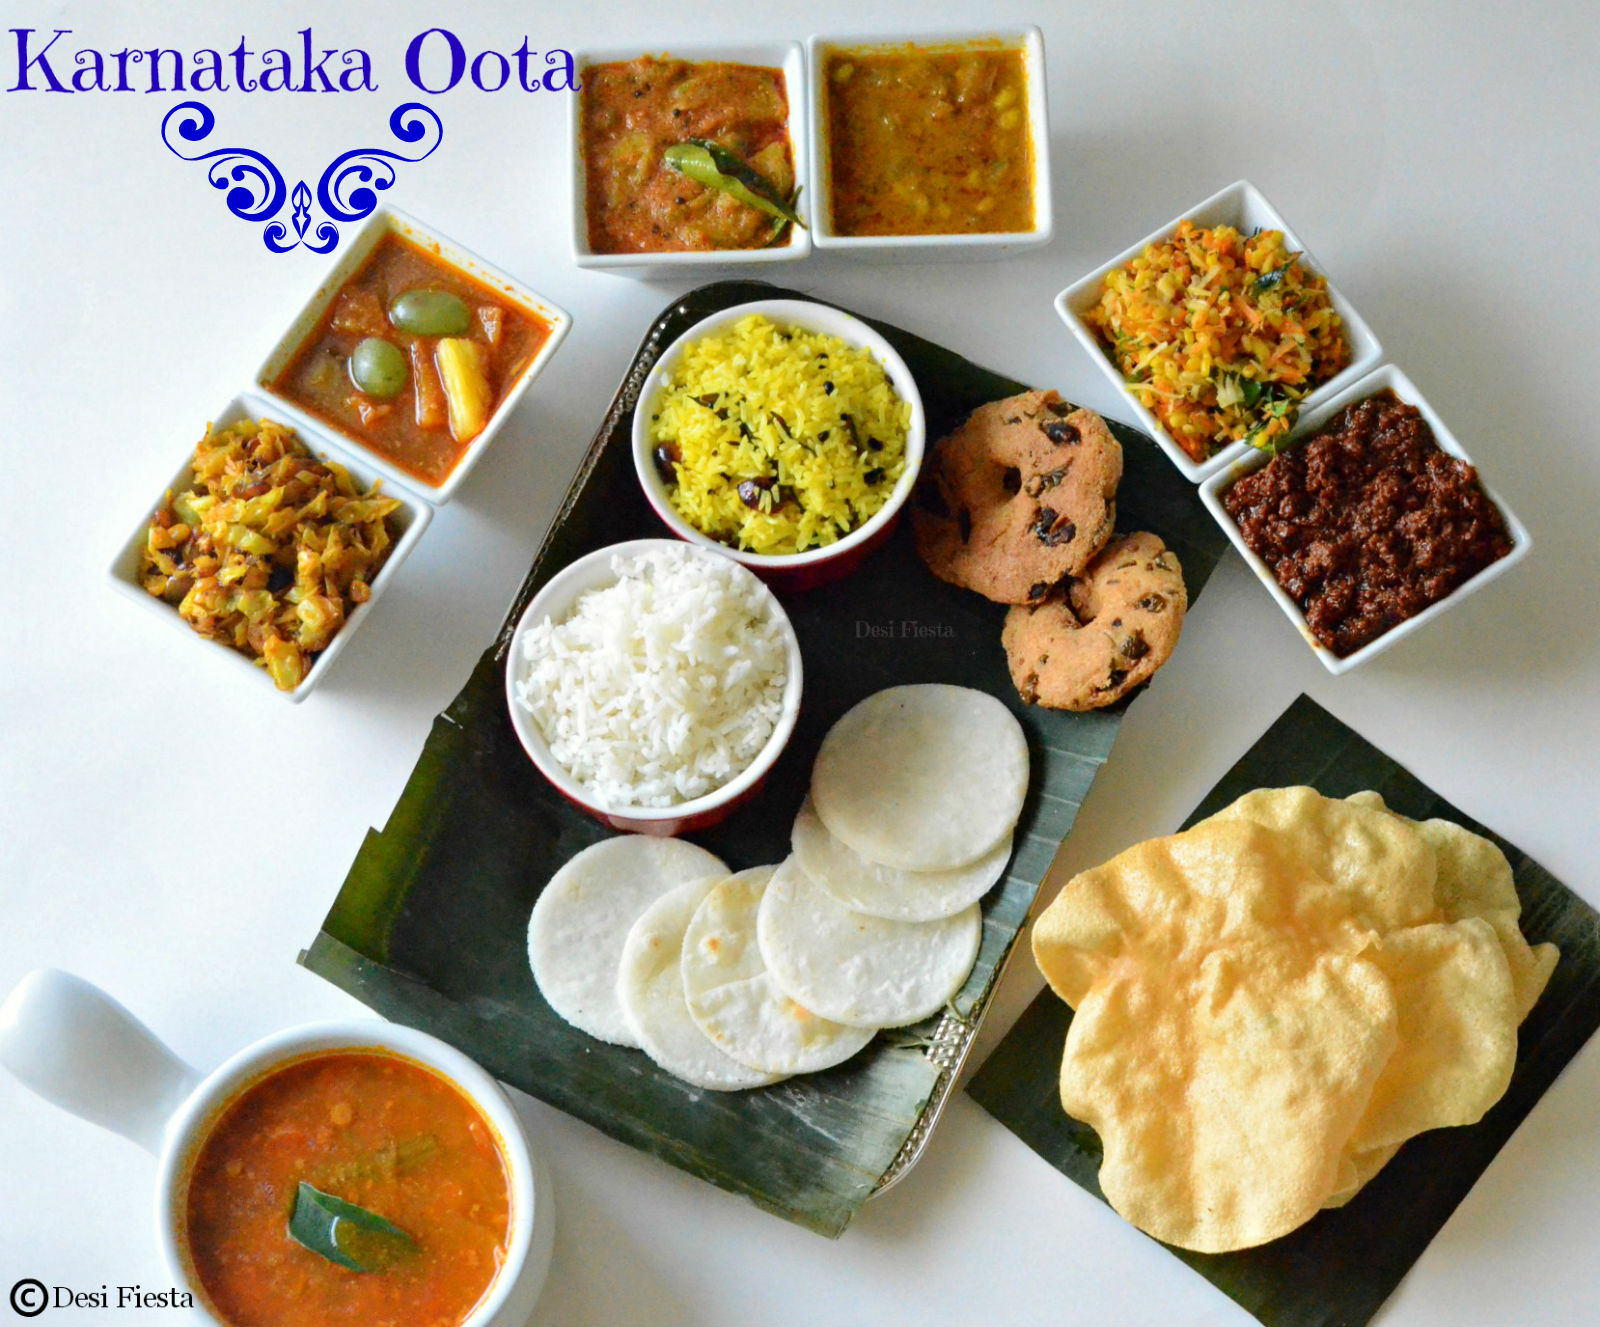 Karnataka oota kannadiga oota kannada thali by desi fiesta foodblogs forumfinder Gallery